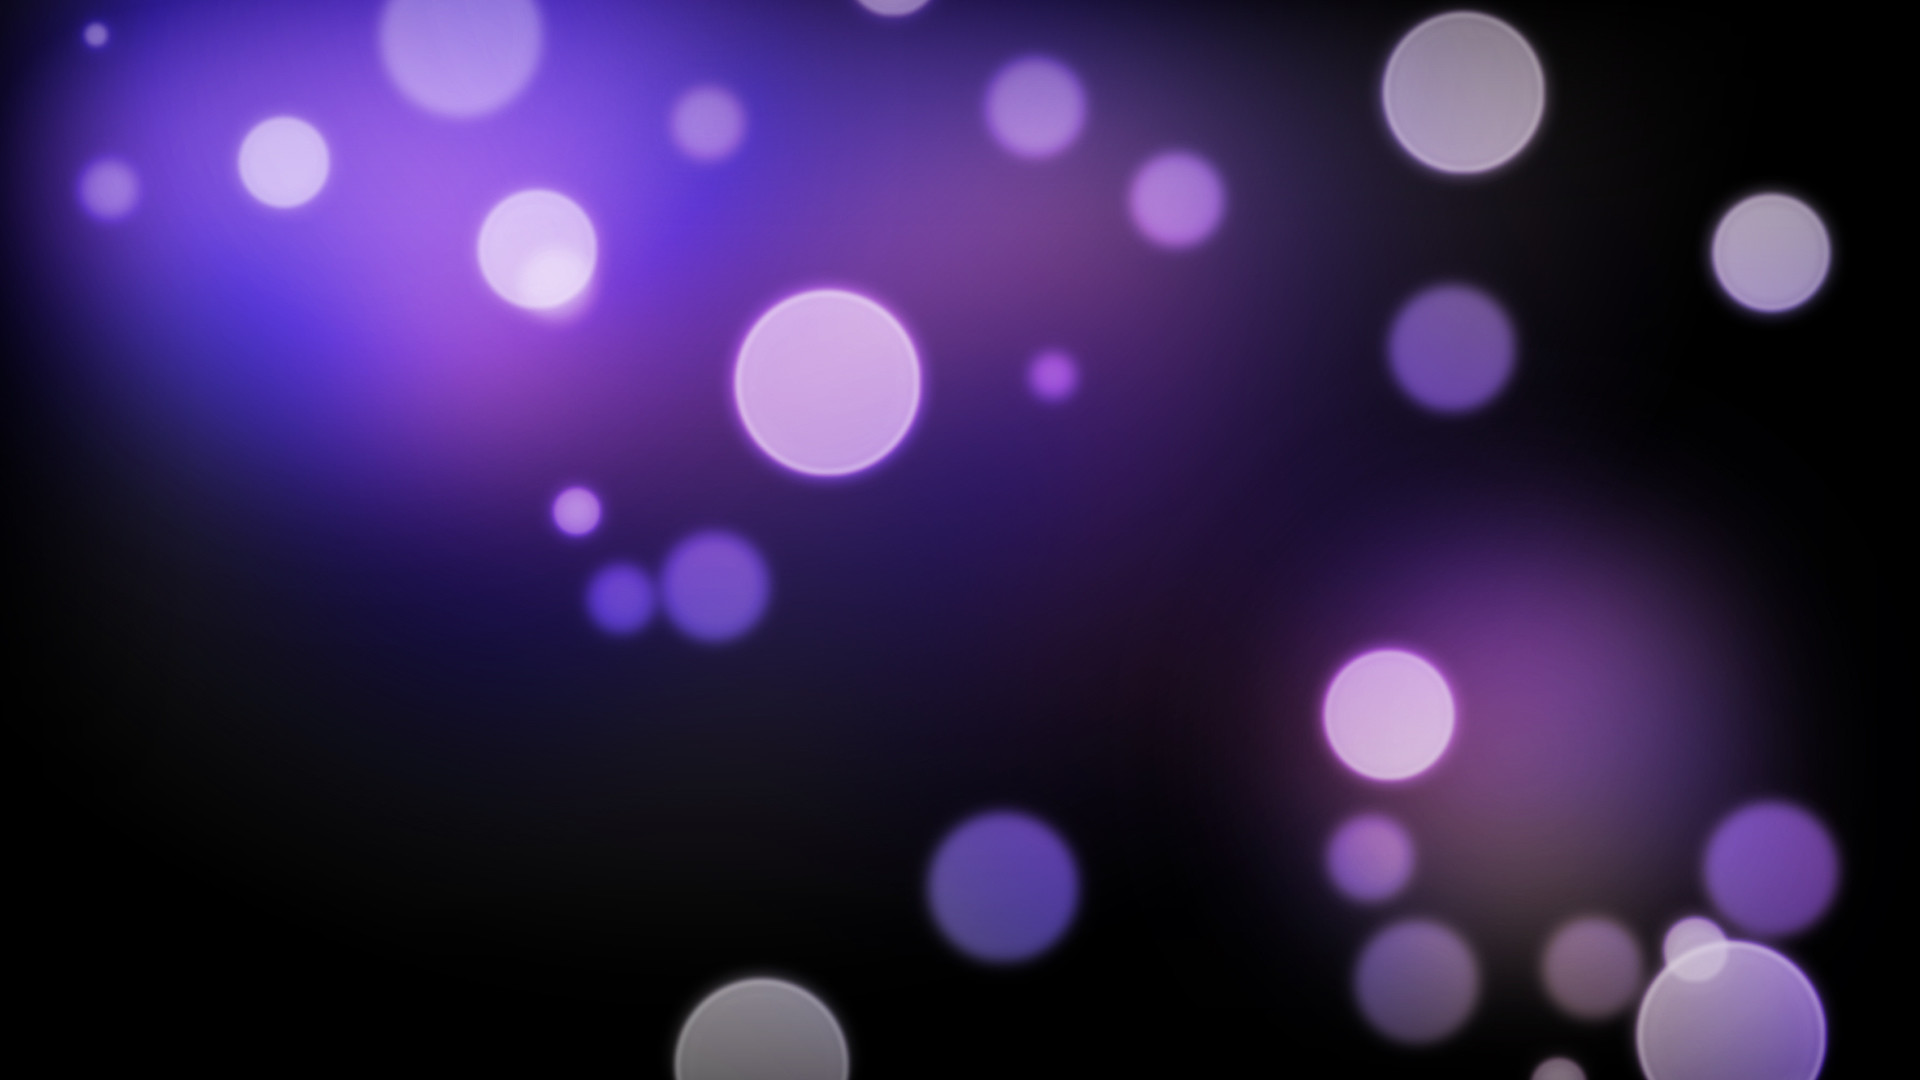 Purple Wallpaper, Color Background | HD Desktop Wallpapers